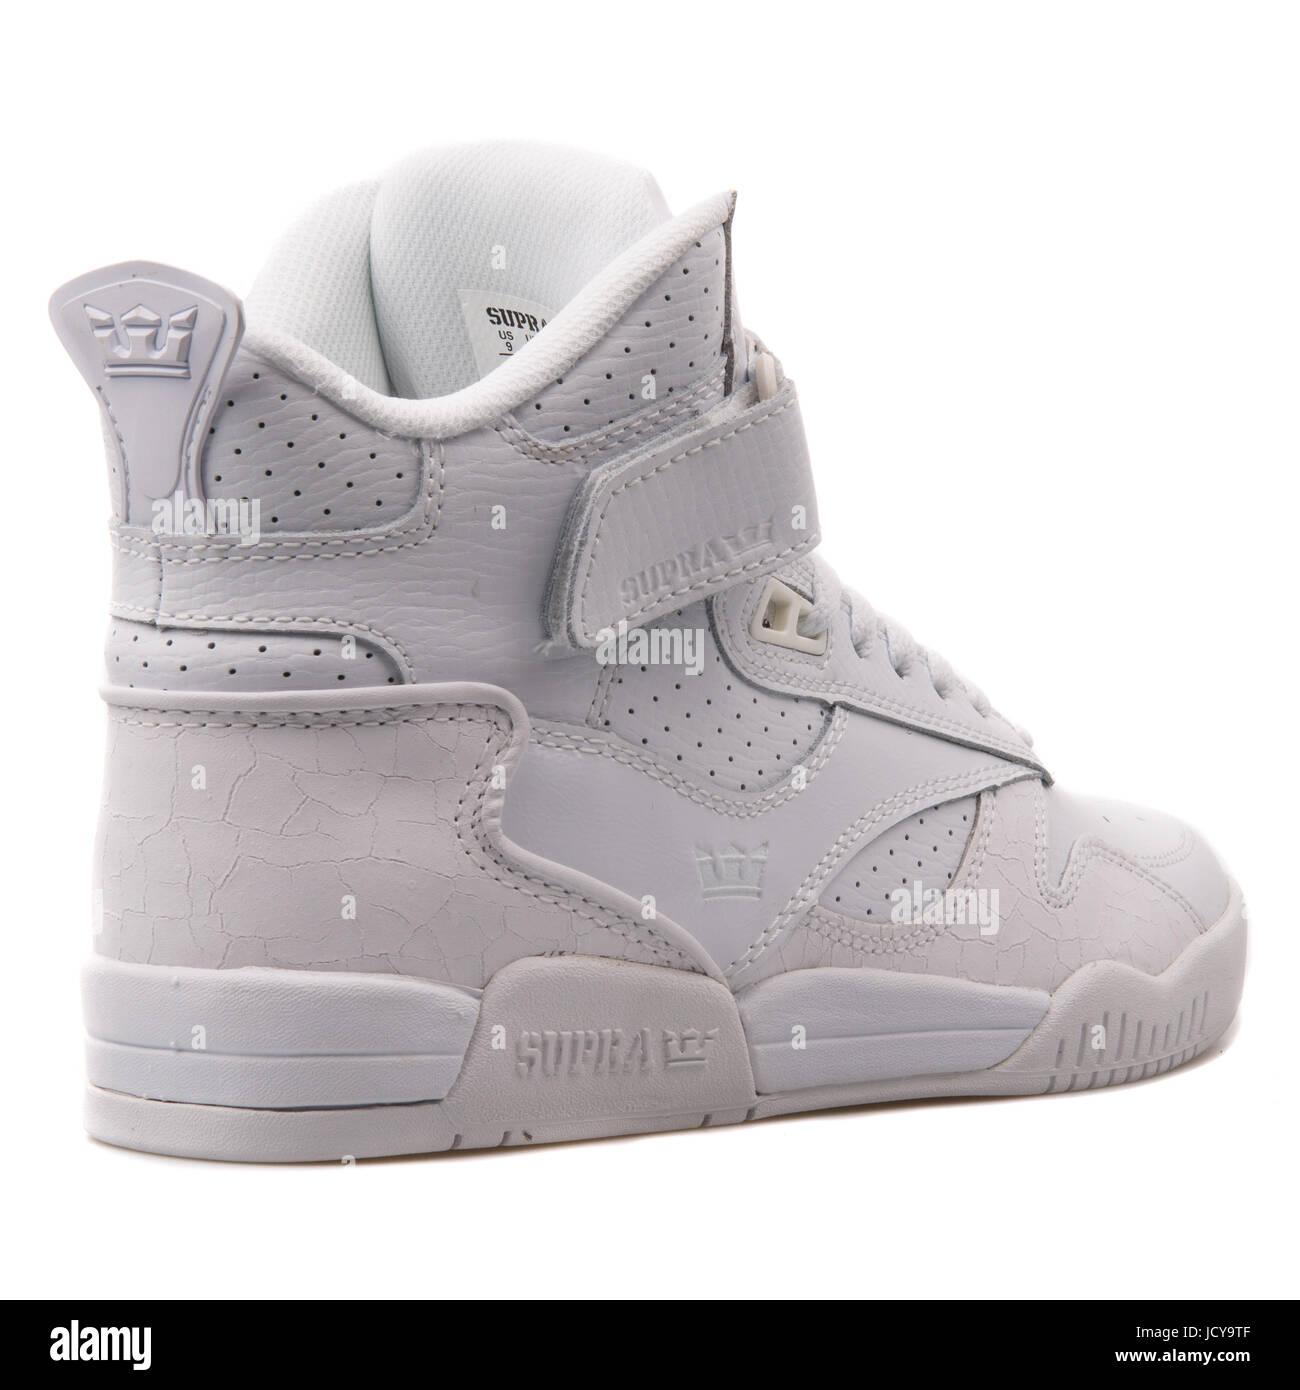 buy popular 02b9b cb8f8 Supra Bleeker White Men s Sportive Shoes - S02103